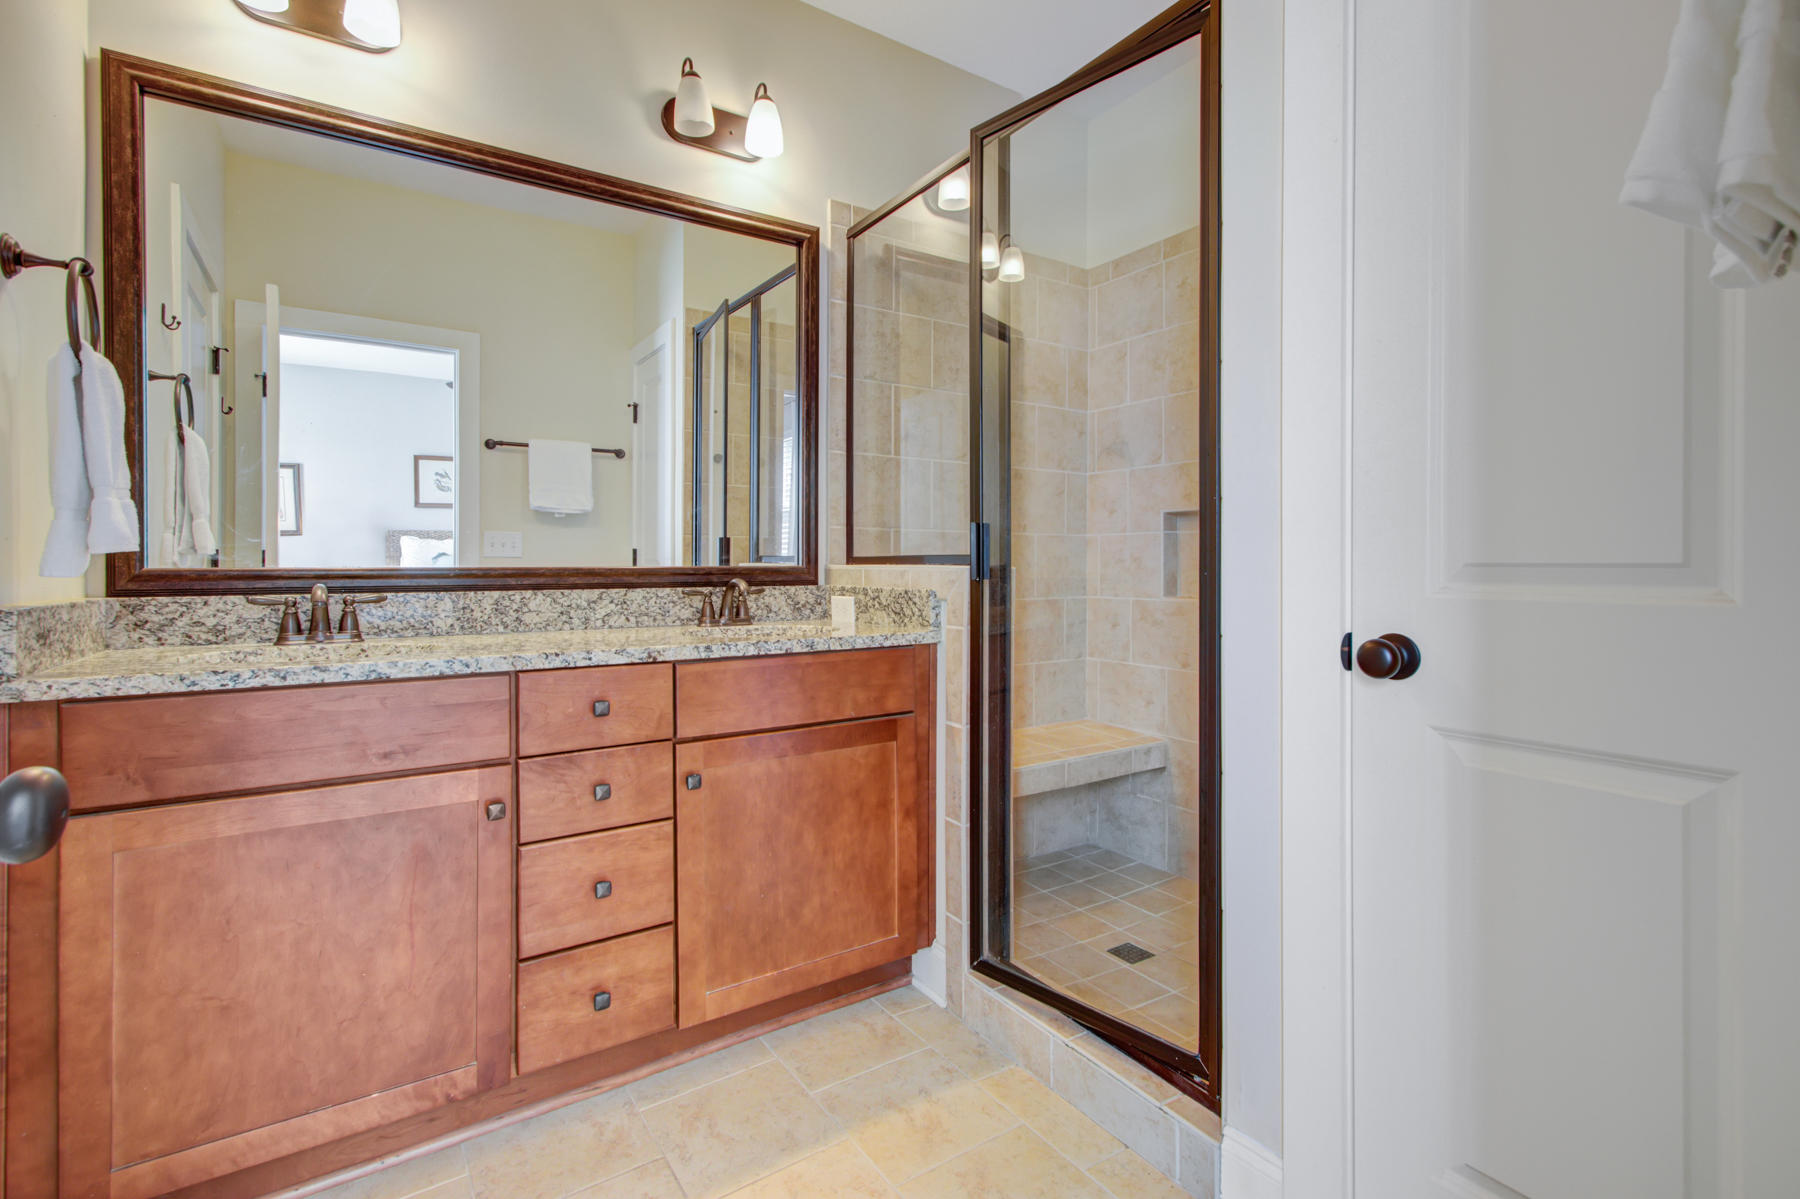 Etiwan Pointe Homes For Sale - 254 Slipper Shell, Mount Pleasant, SC - 9